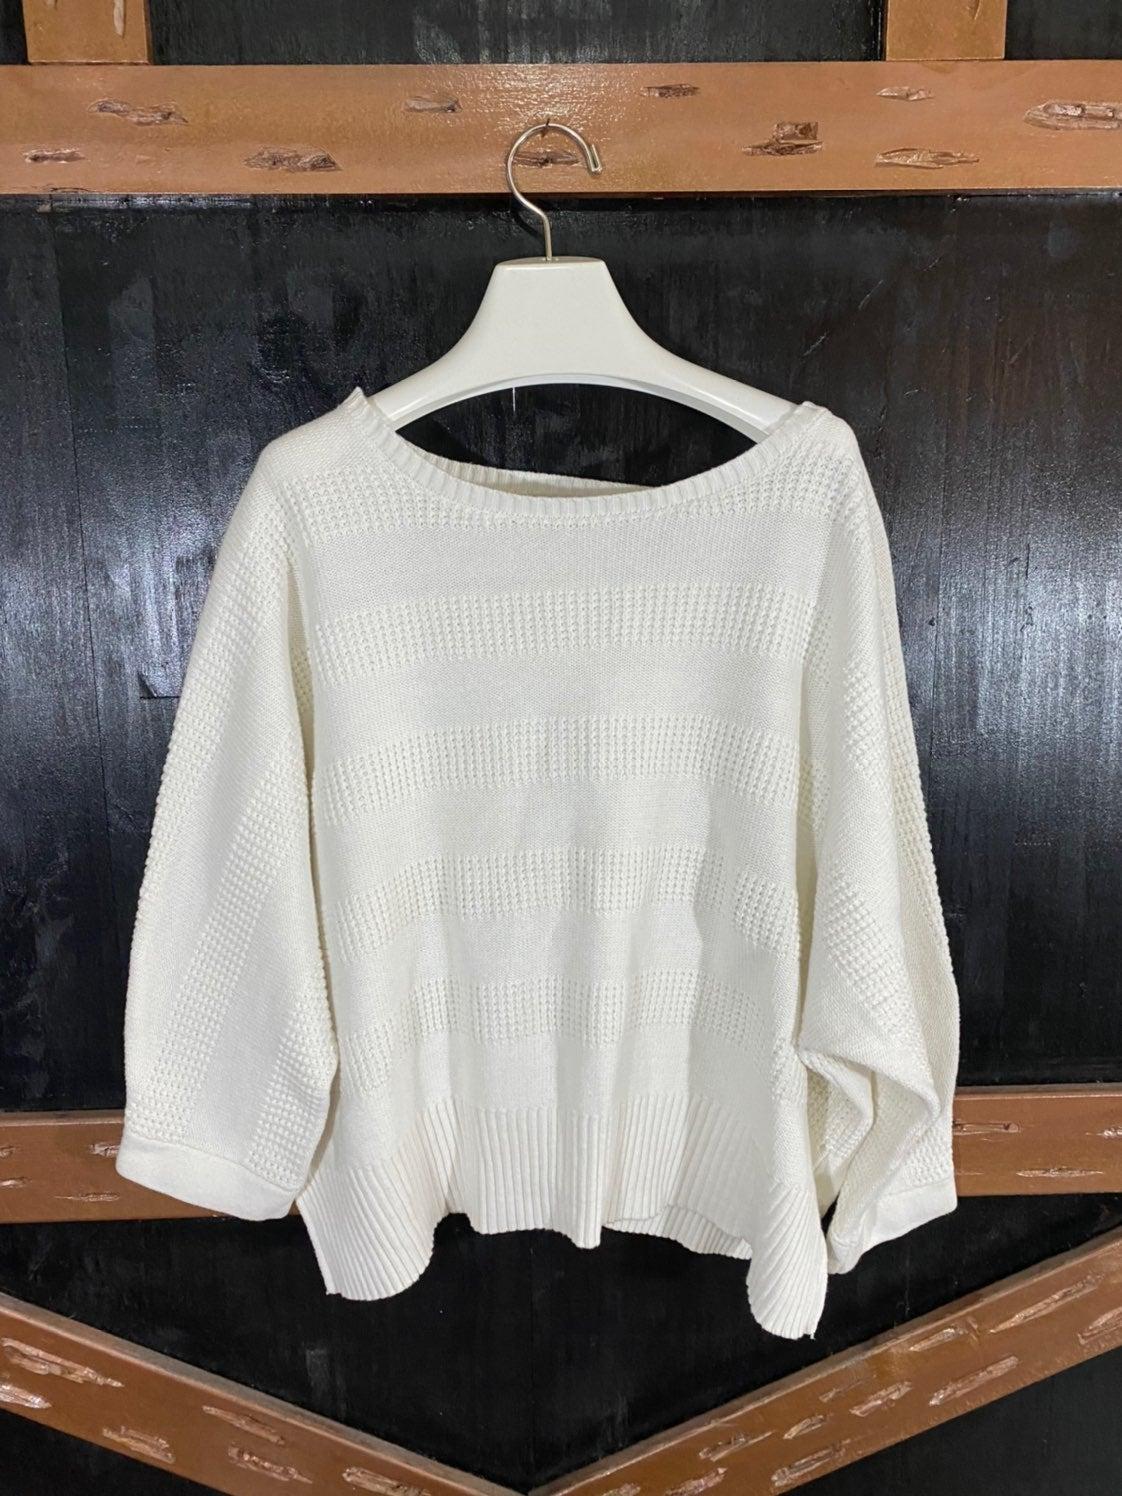 3x Liz Claiborne white Sweater